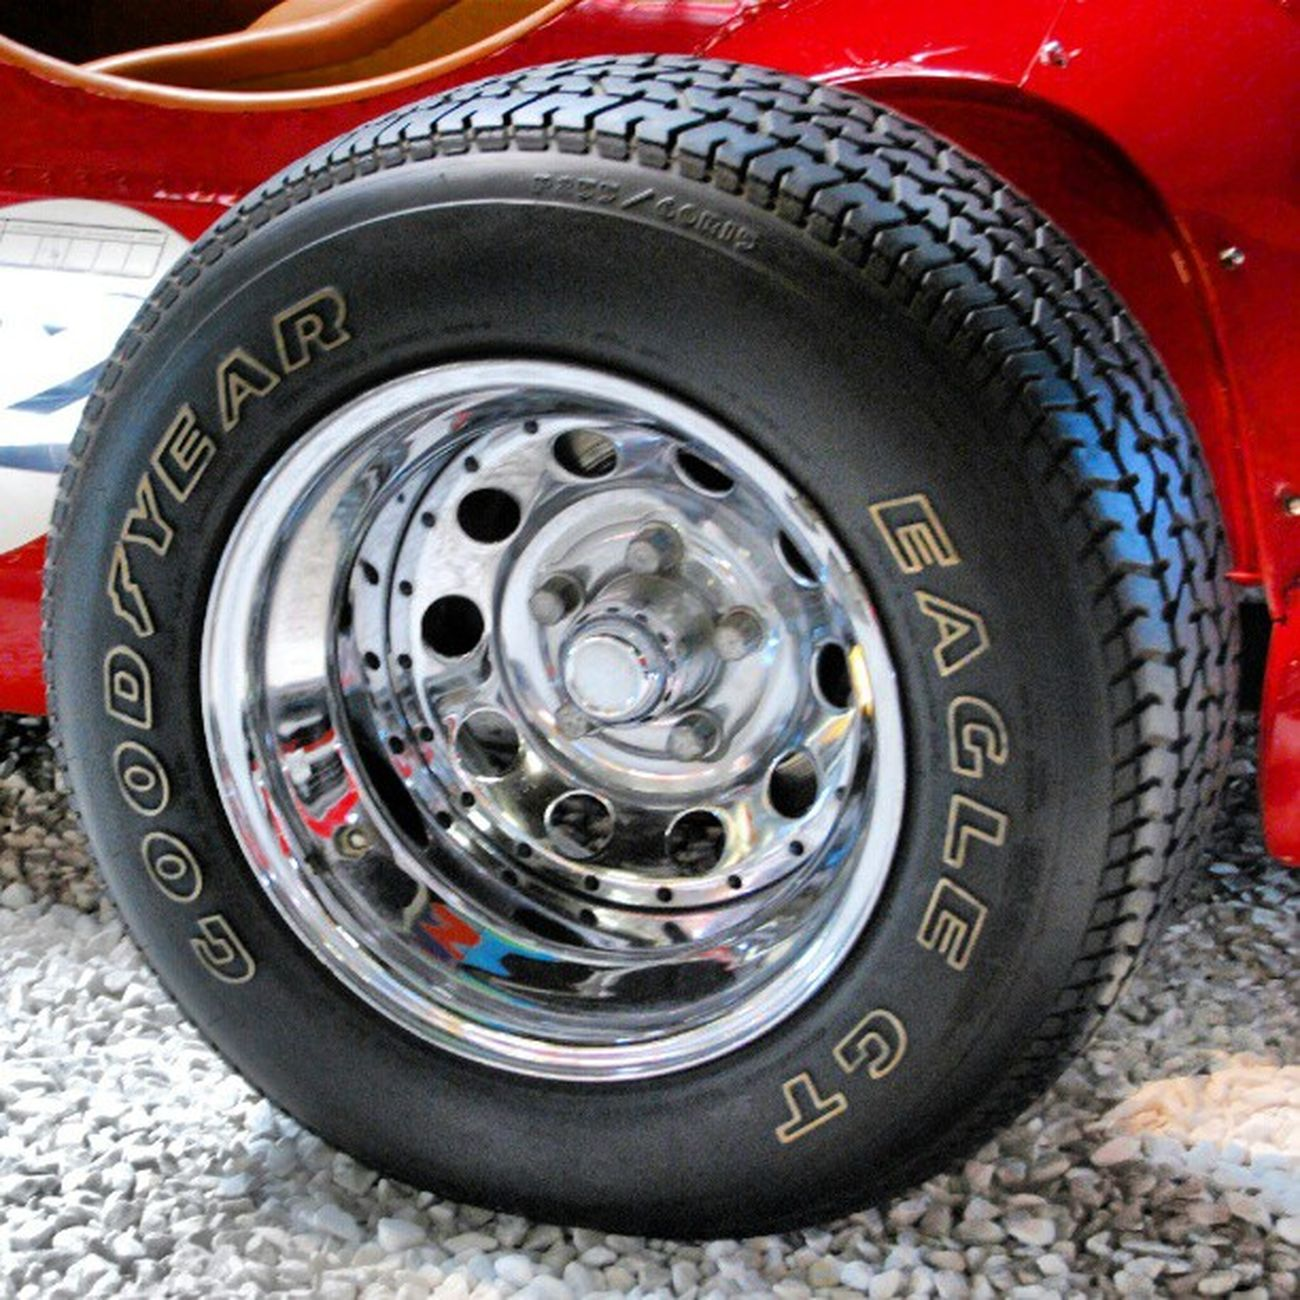 #car #tire #igers #igfamos #instagood Car Tire Igers Instagood Igfamos